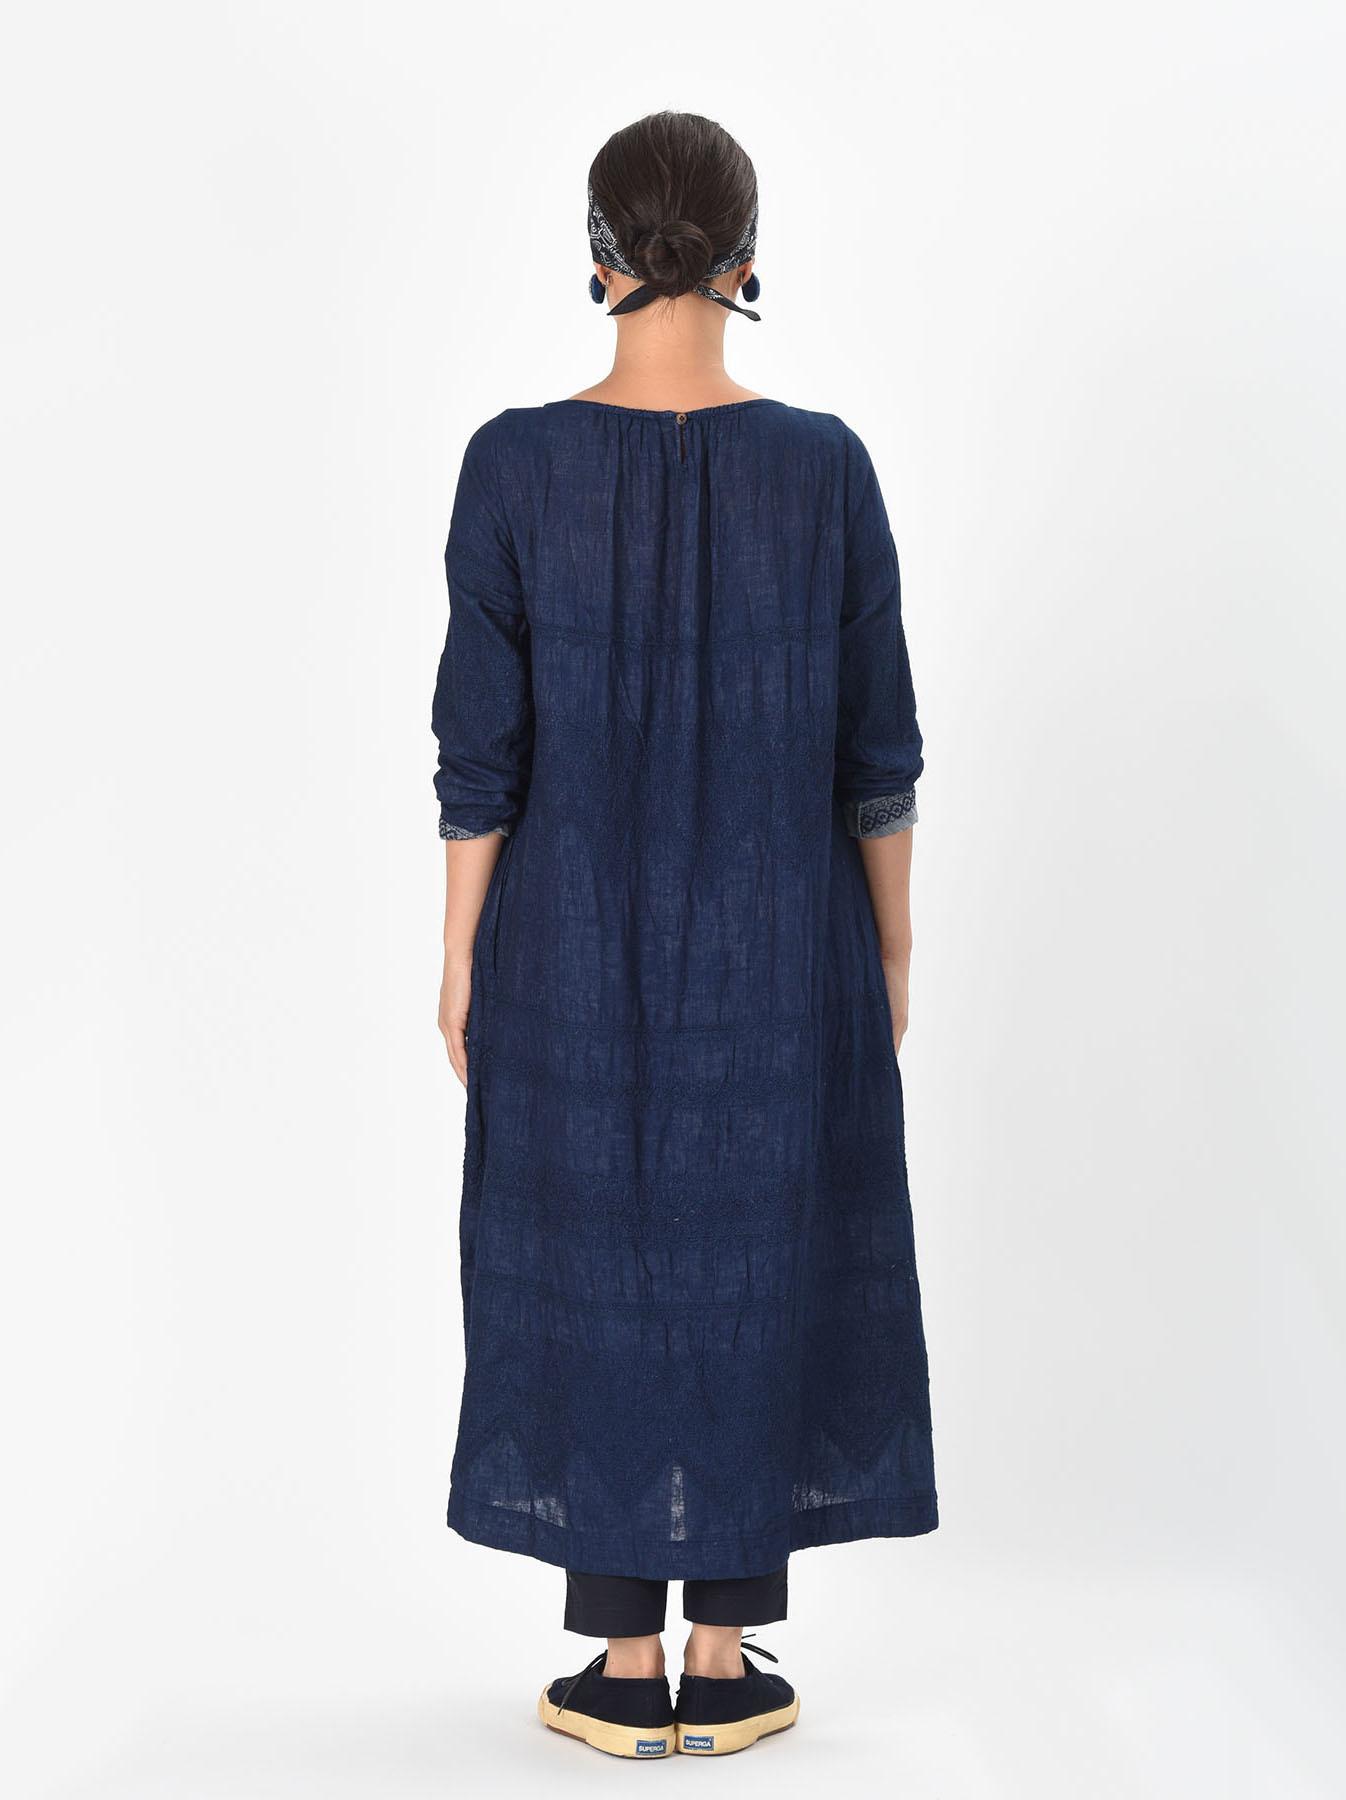 Indigo Double Cloth Lace Embroidery Dress-4